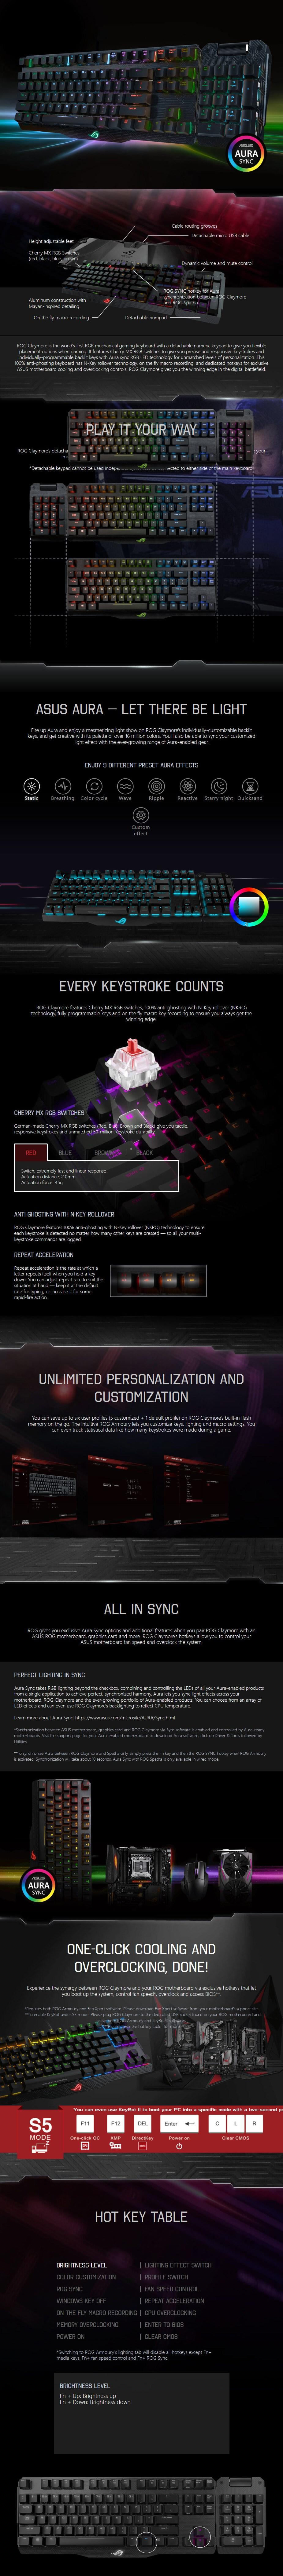 ASUS ROG Claymore RGB Mechanical Gaming Keyboard - Cherry MX